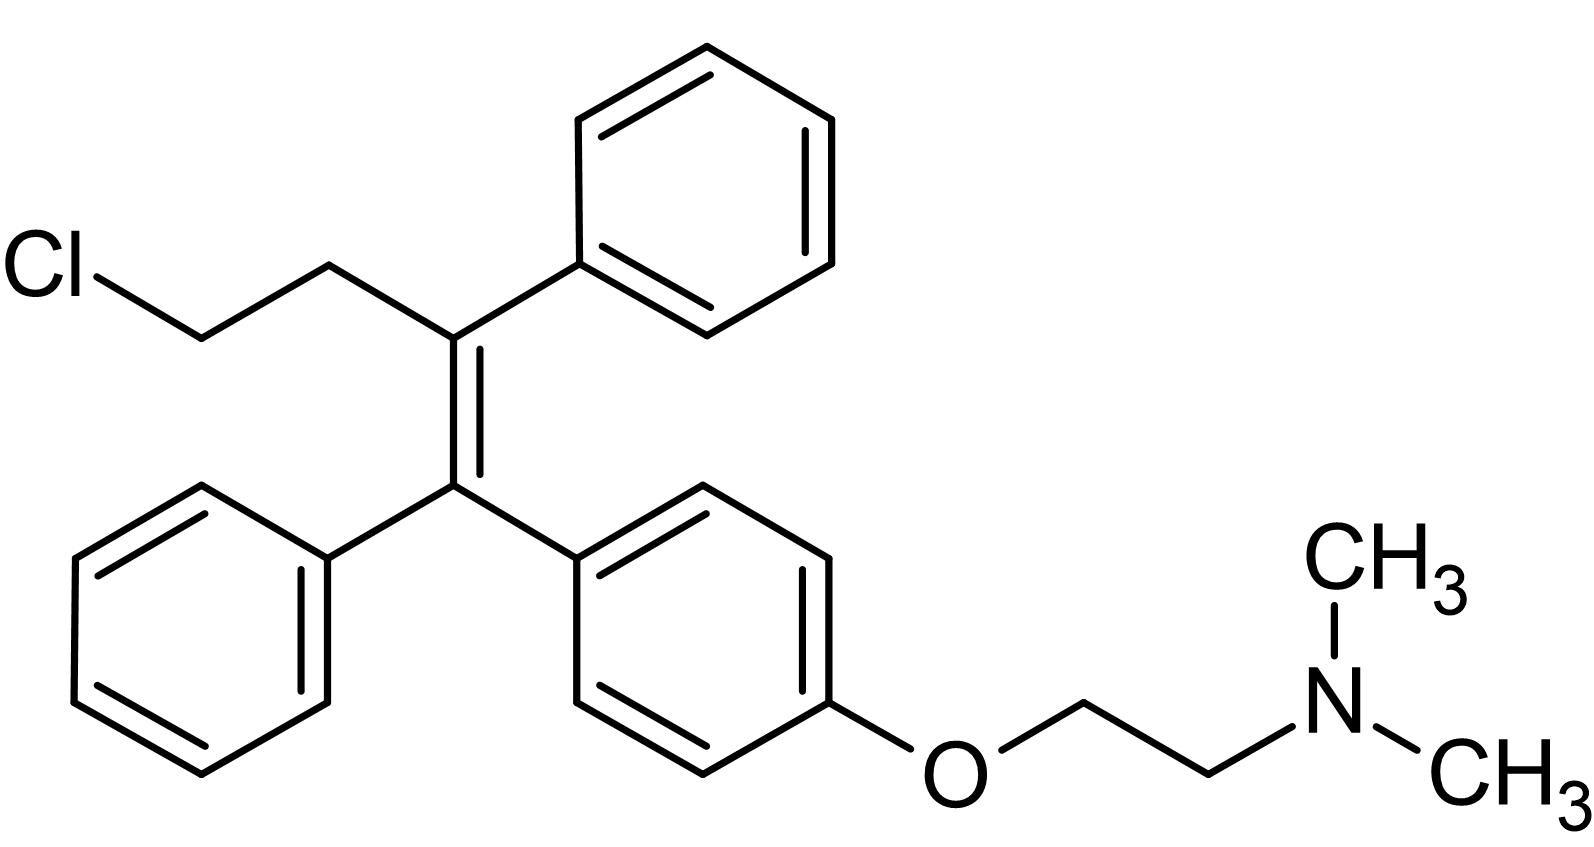 Chemical Structure - (Z)-Toremifene, estrogen biosynthesis inhibitor (ab142467)